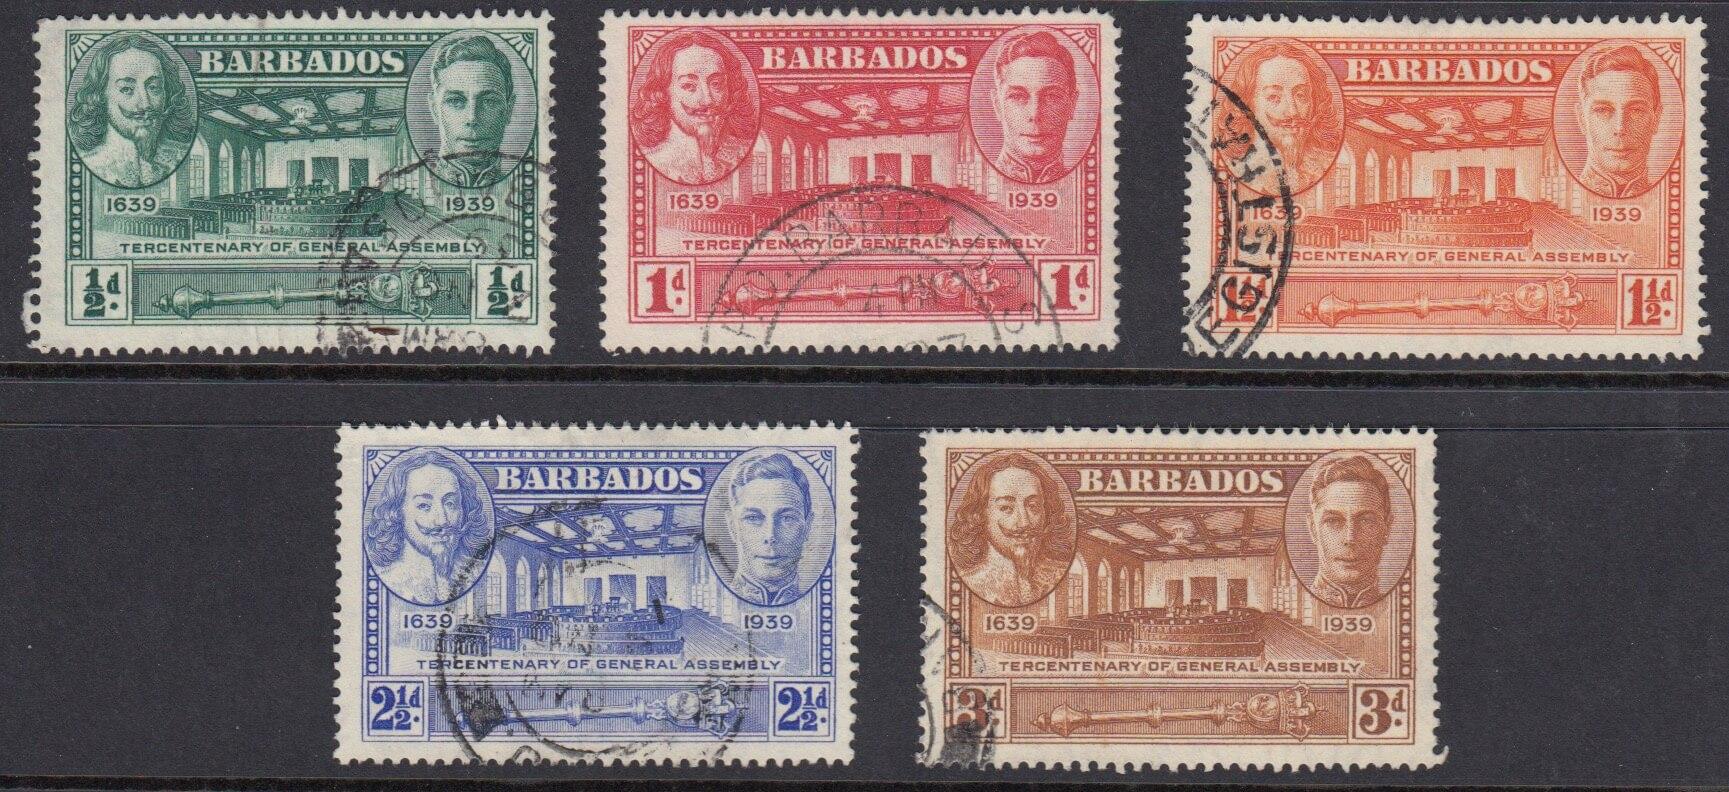 Barbados SG257-261 | Tercentenary of General Assembly